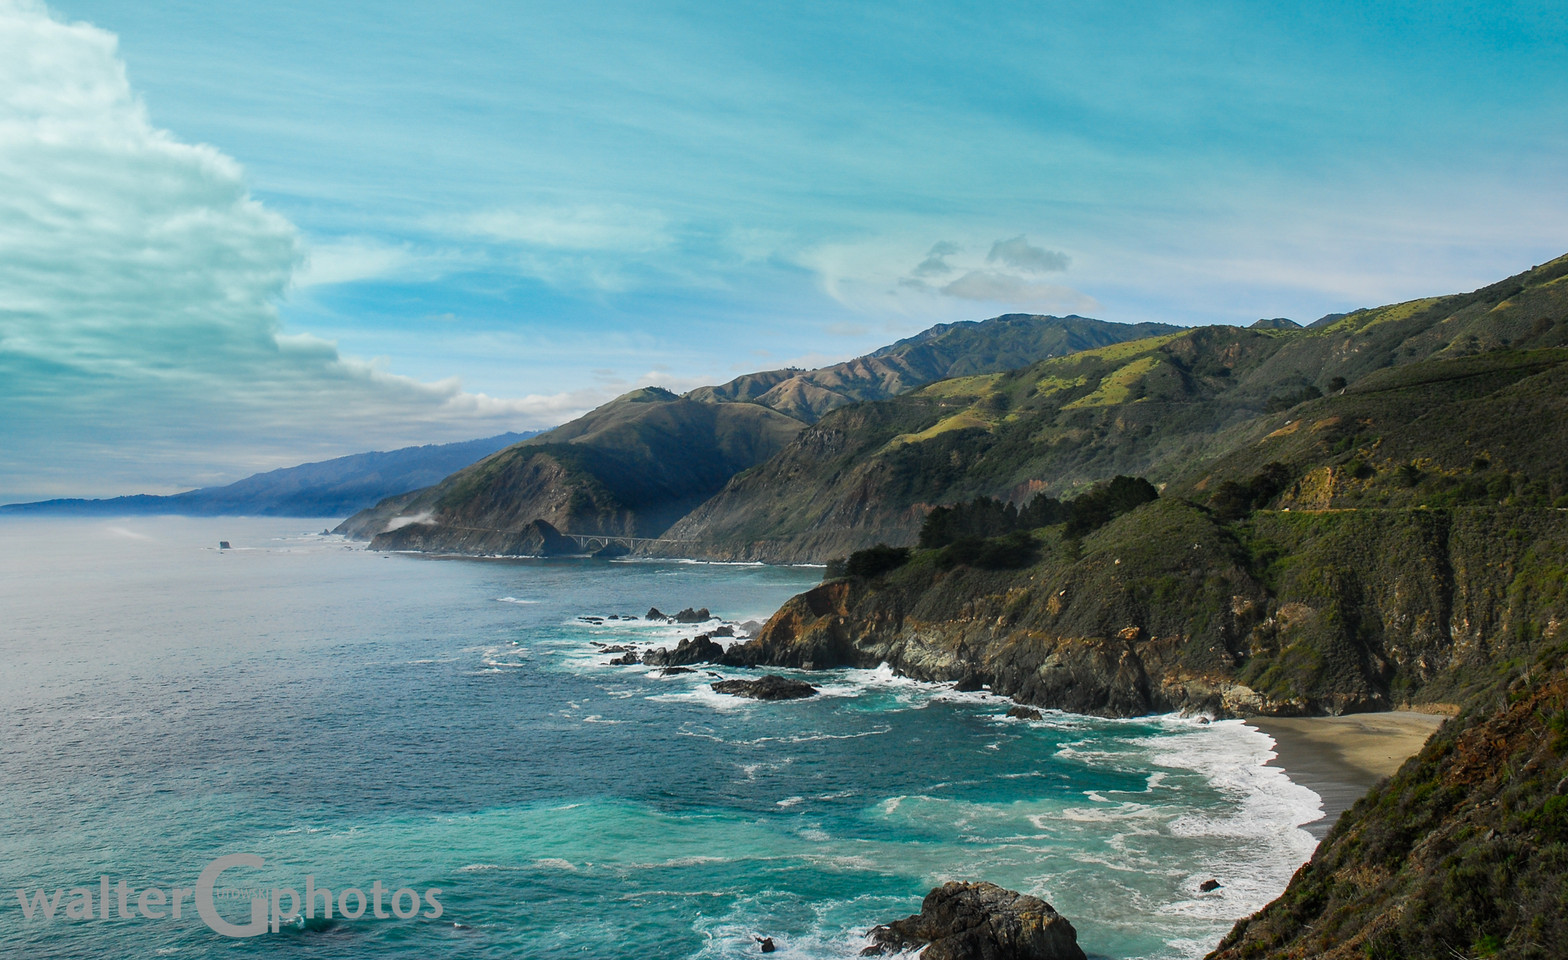 Pacific Coast Highway Seascape